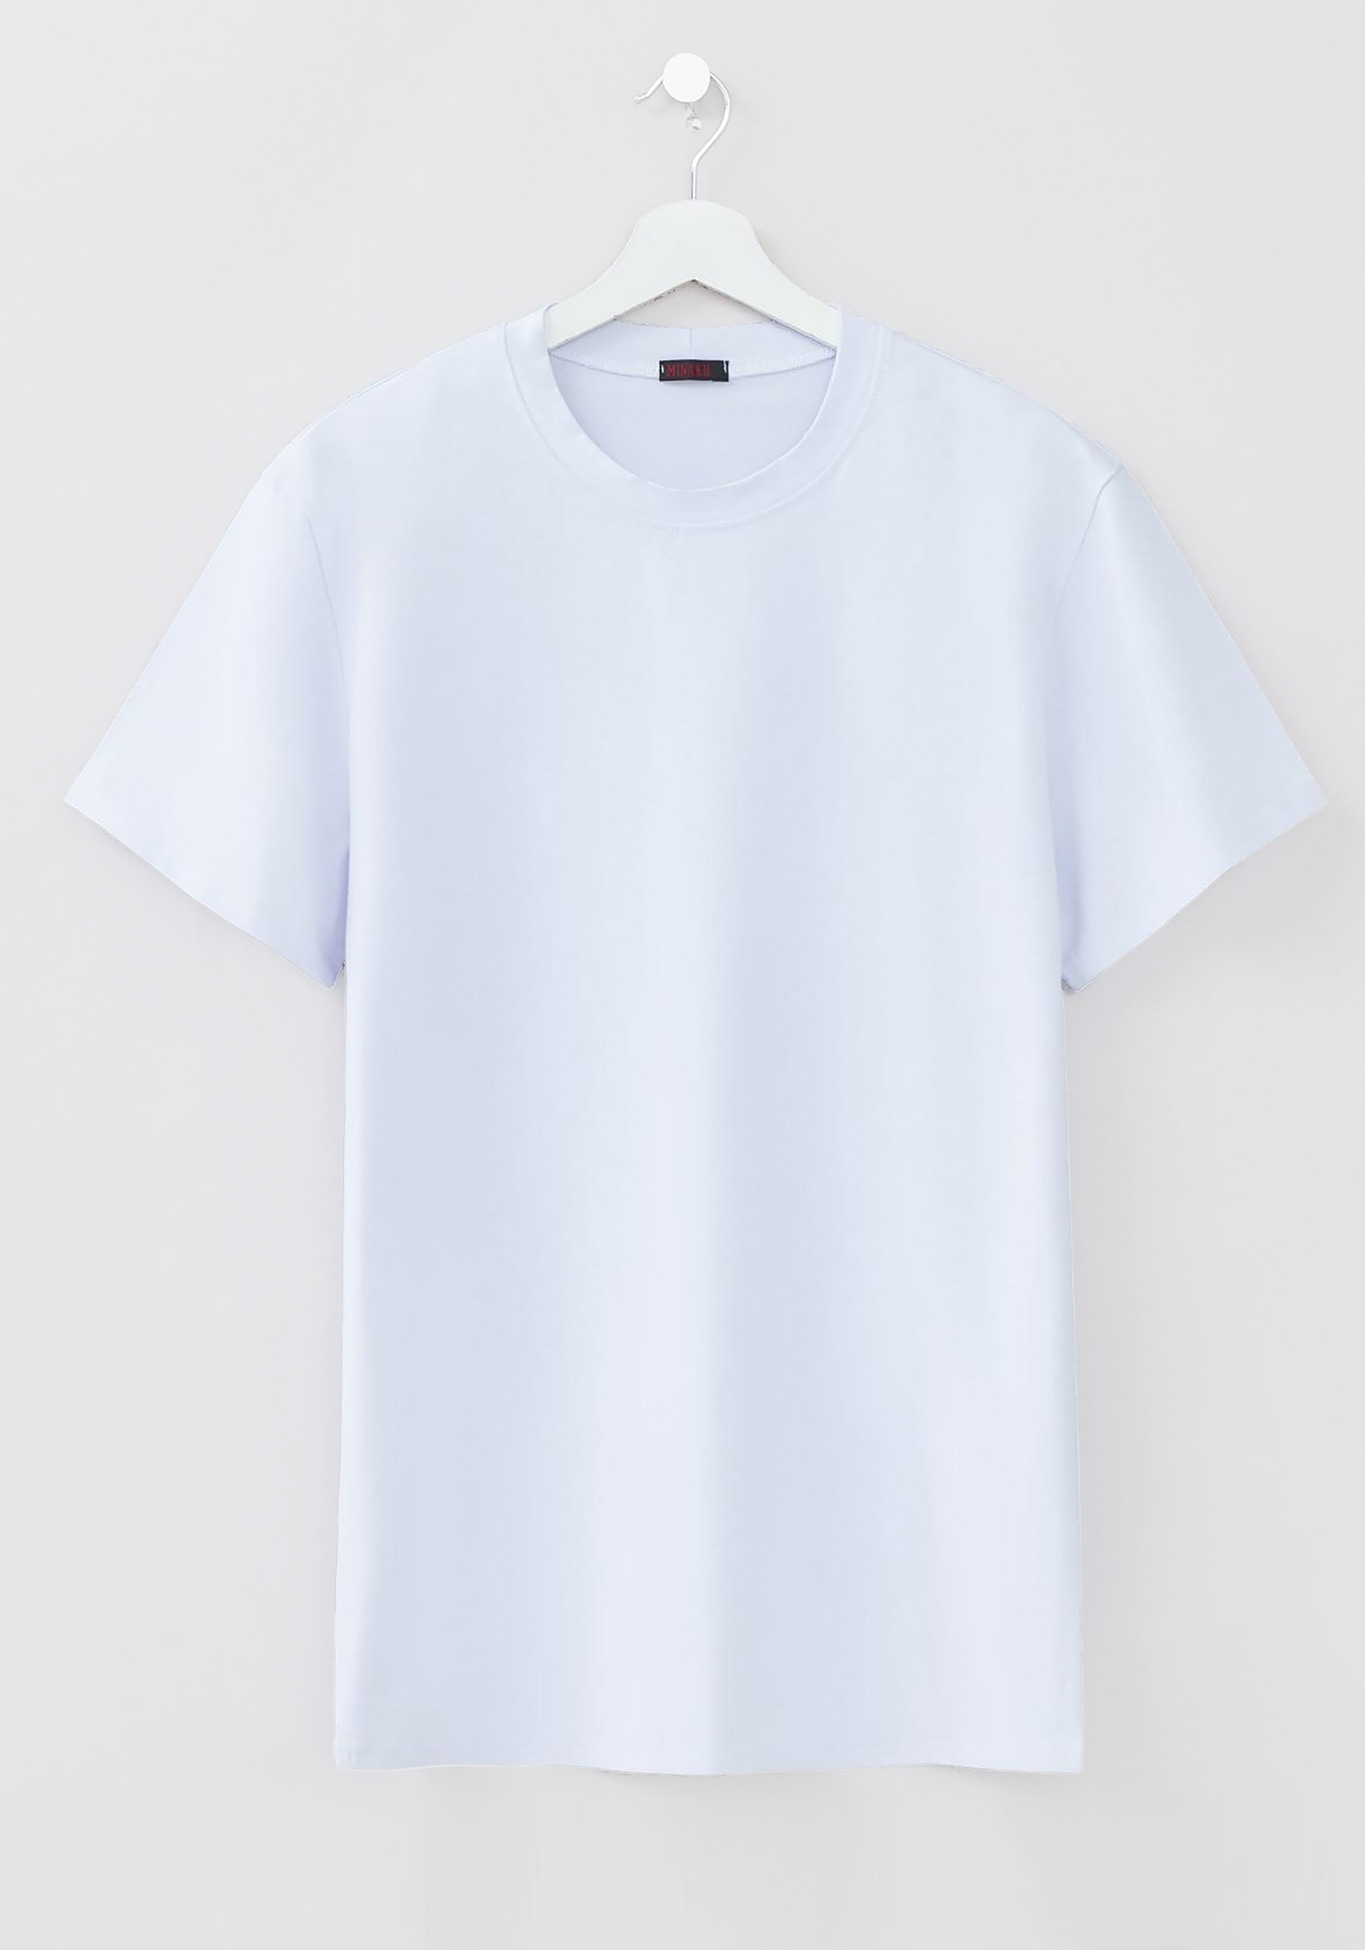 Футболка мужская MINAKU: Basic line